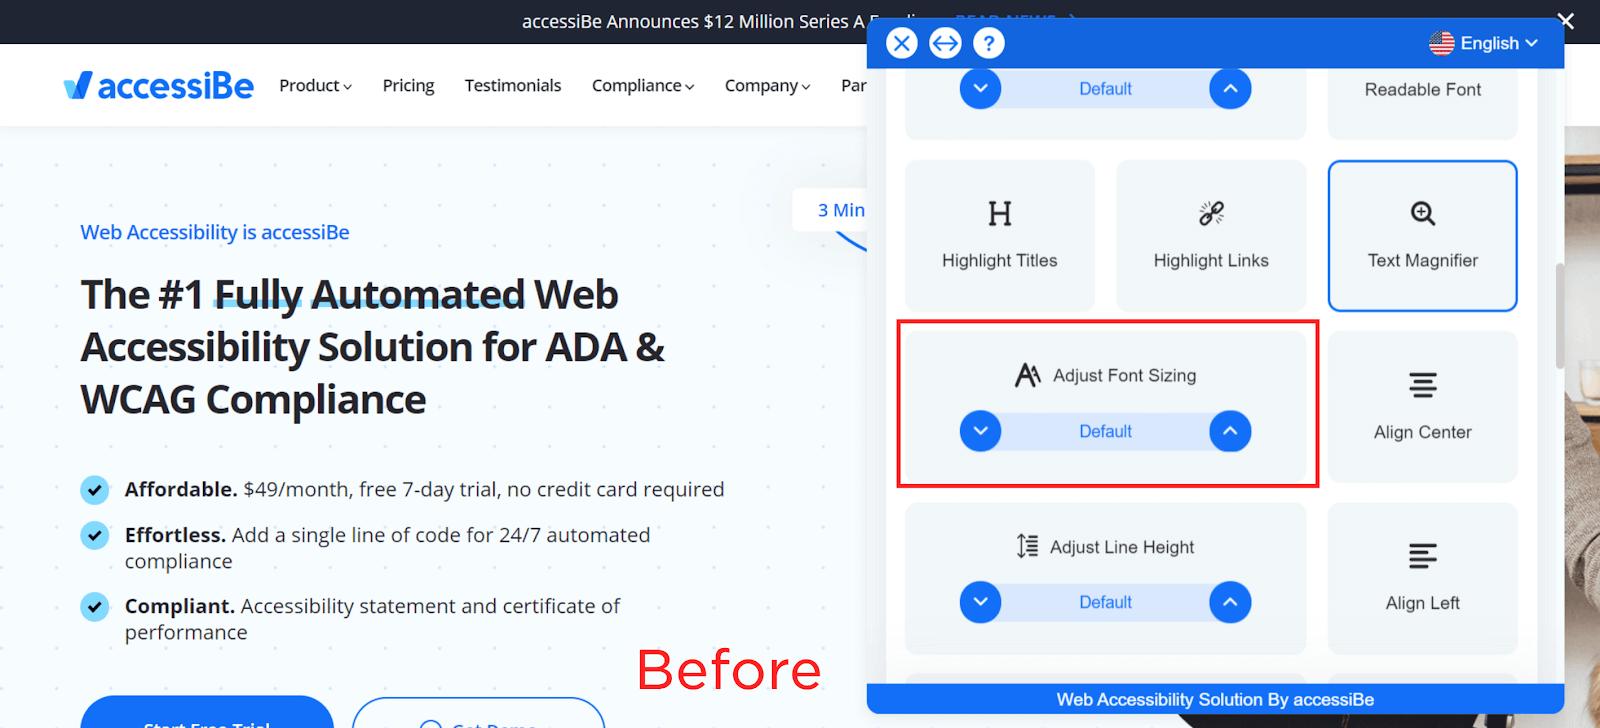 Adjust Font Sizing